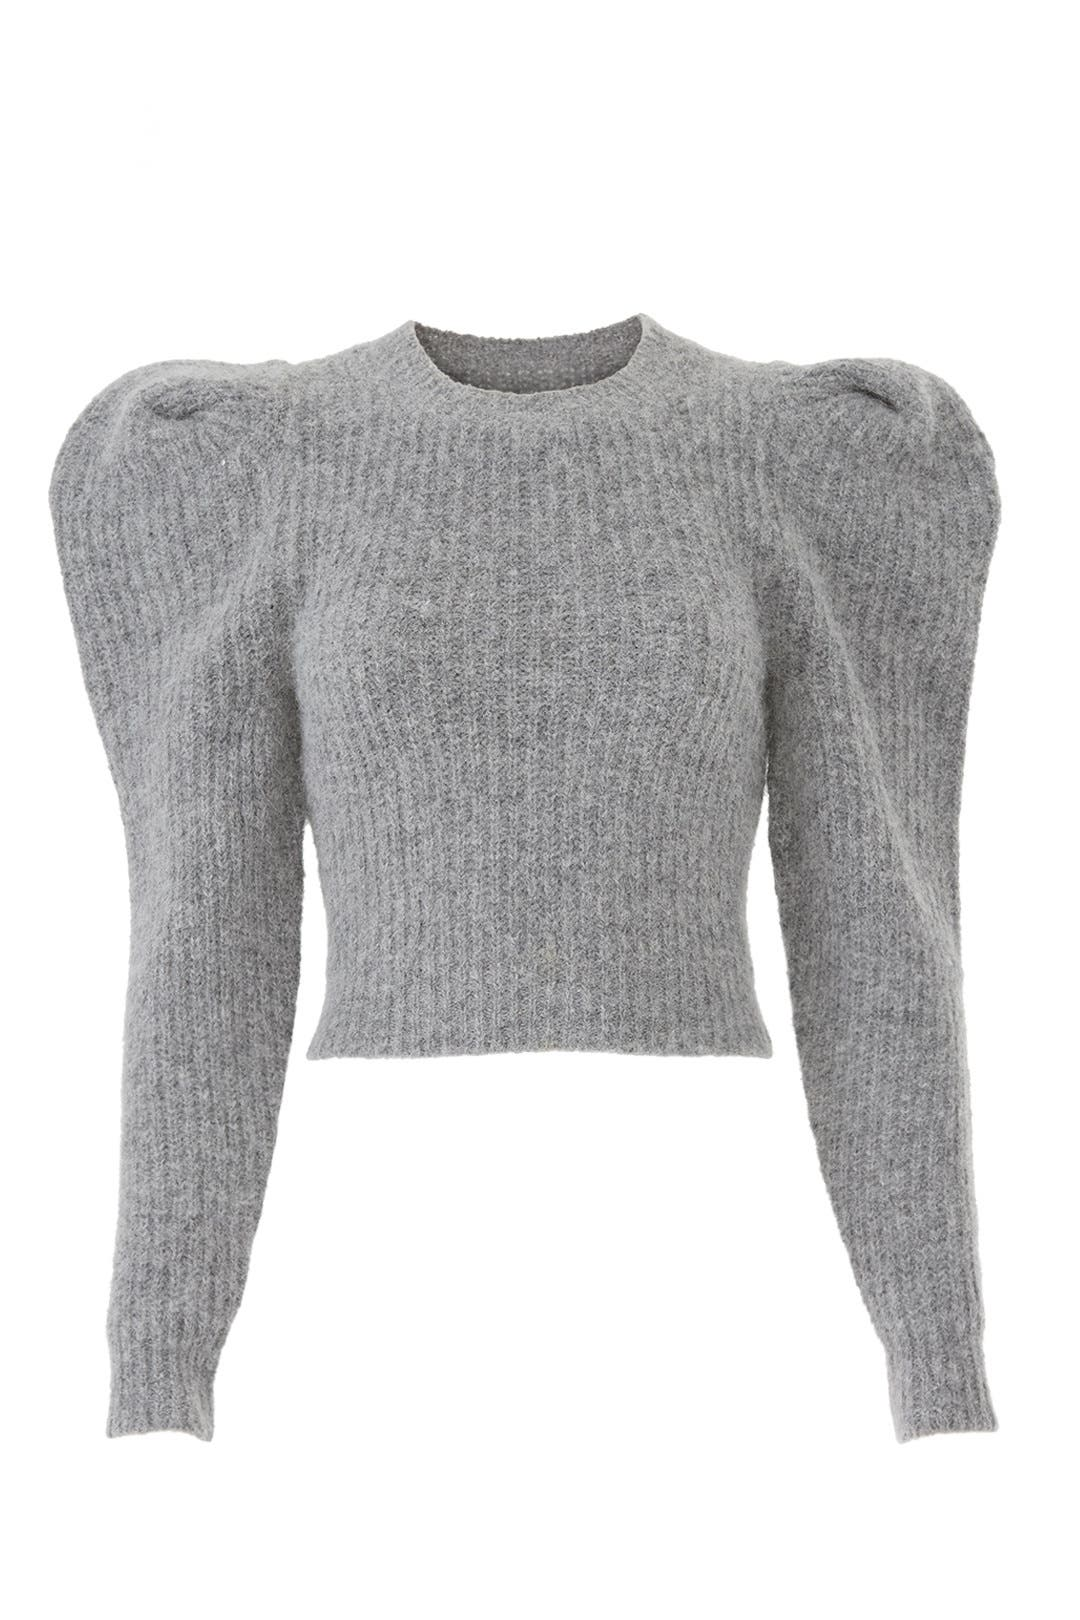 Puffed Shoulders Sweater by Philosophy di Lorenzo Serafini for  75 ... 19f4392c3